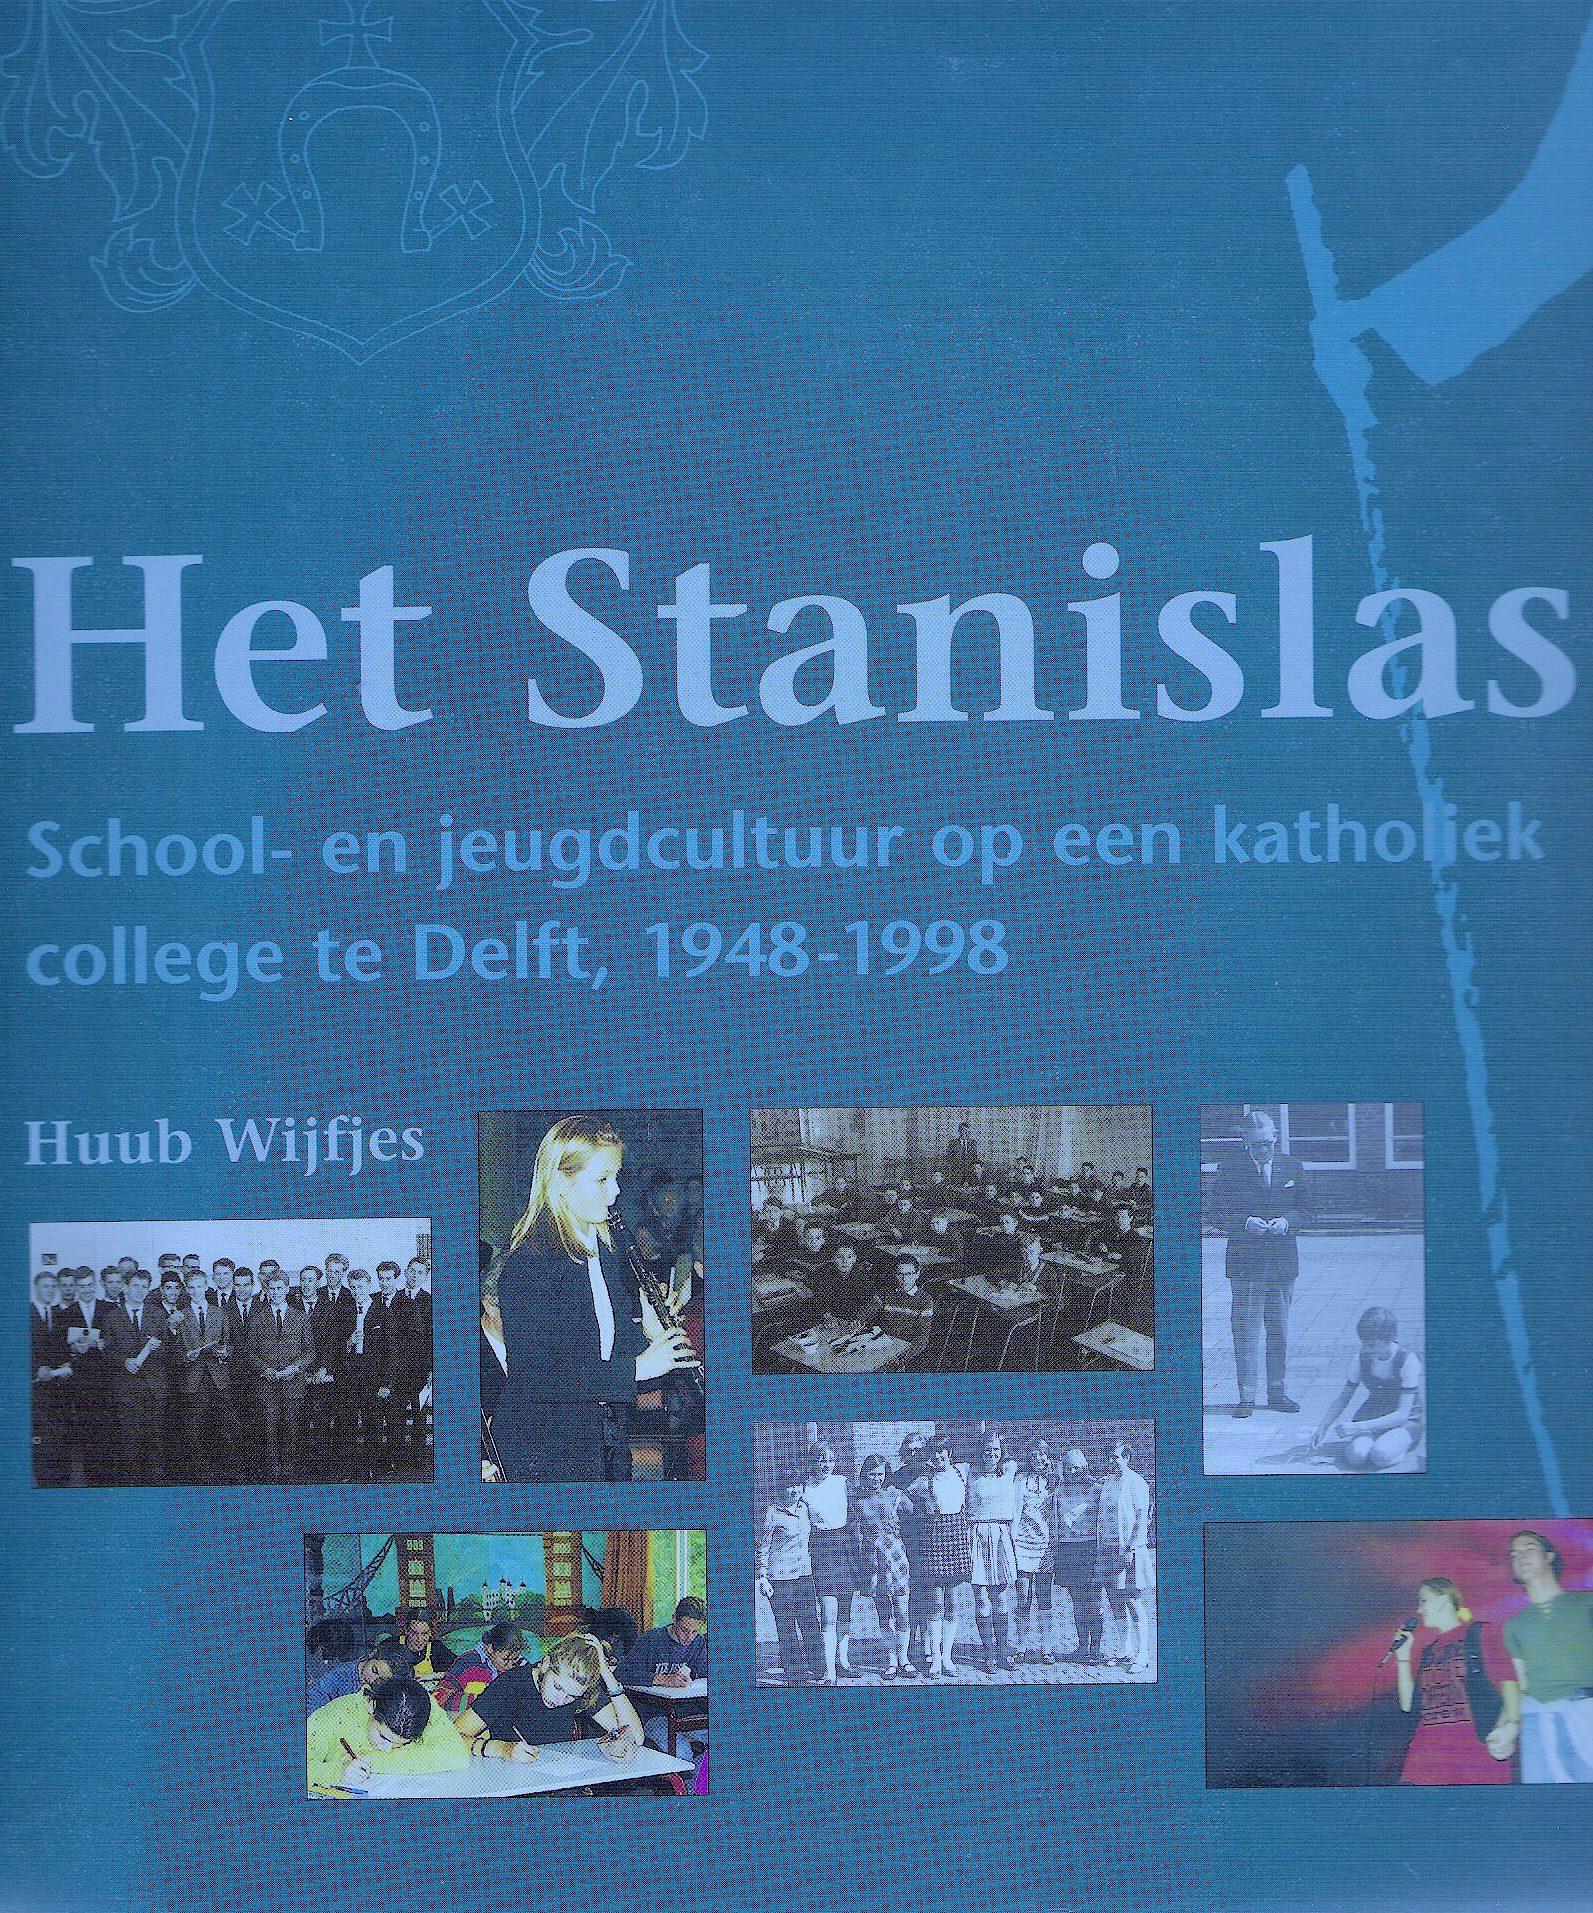 Stanislas High School